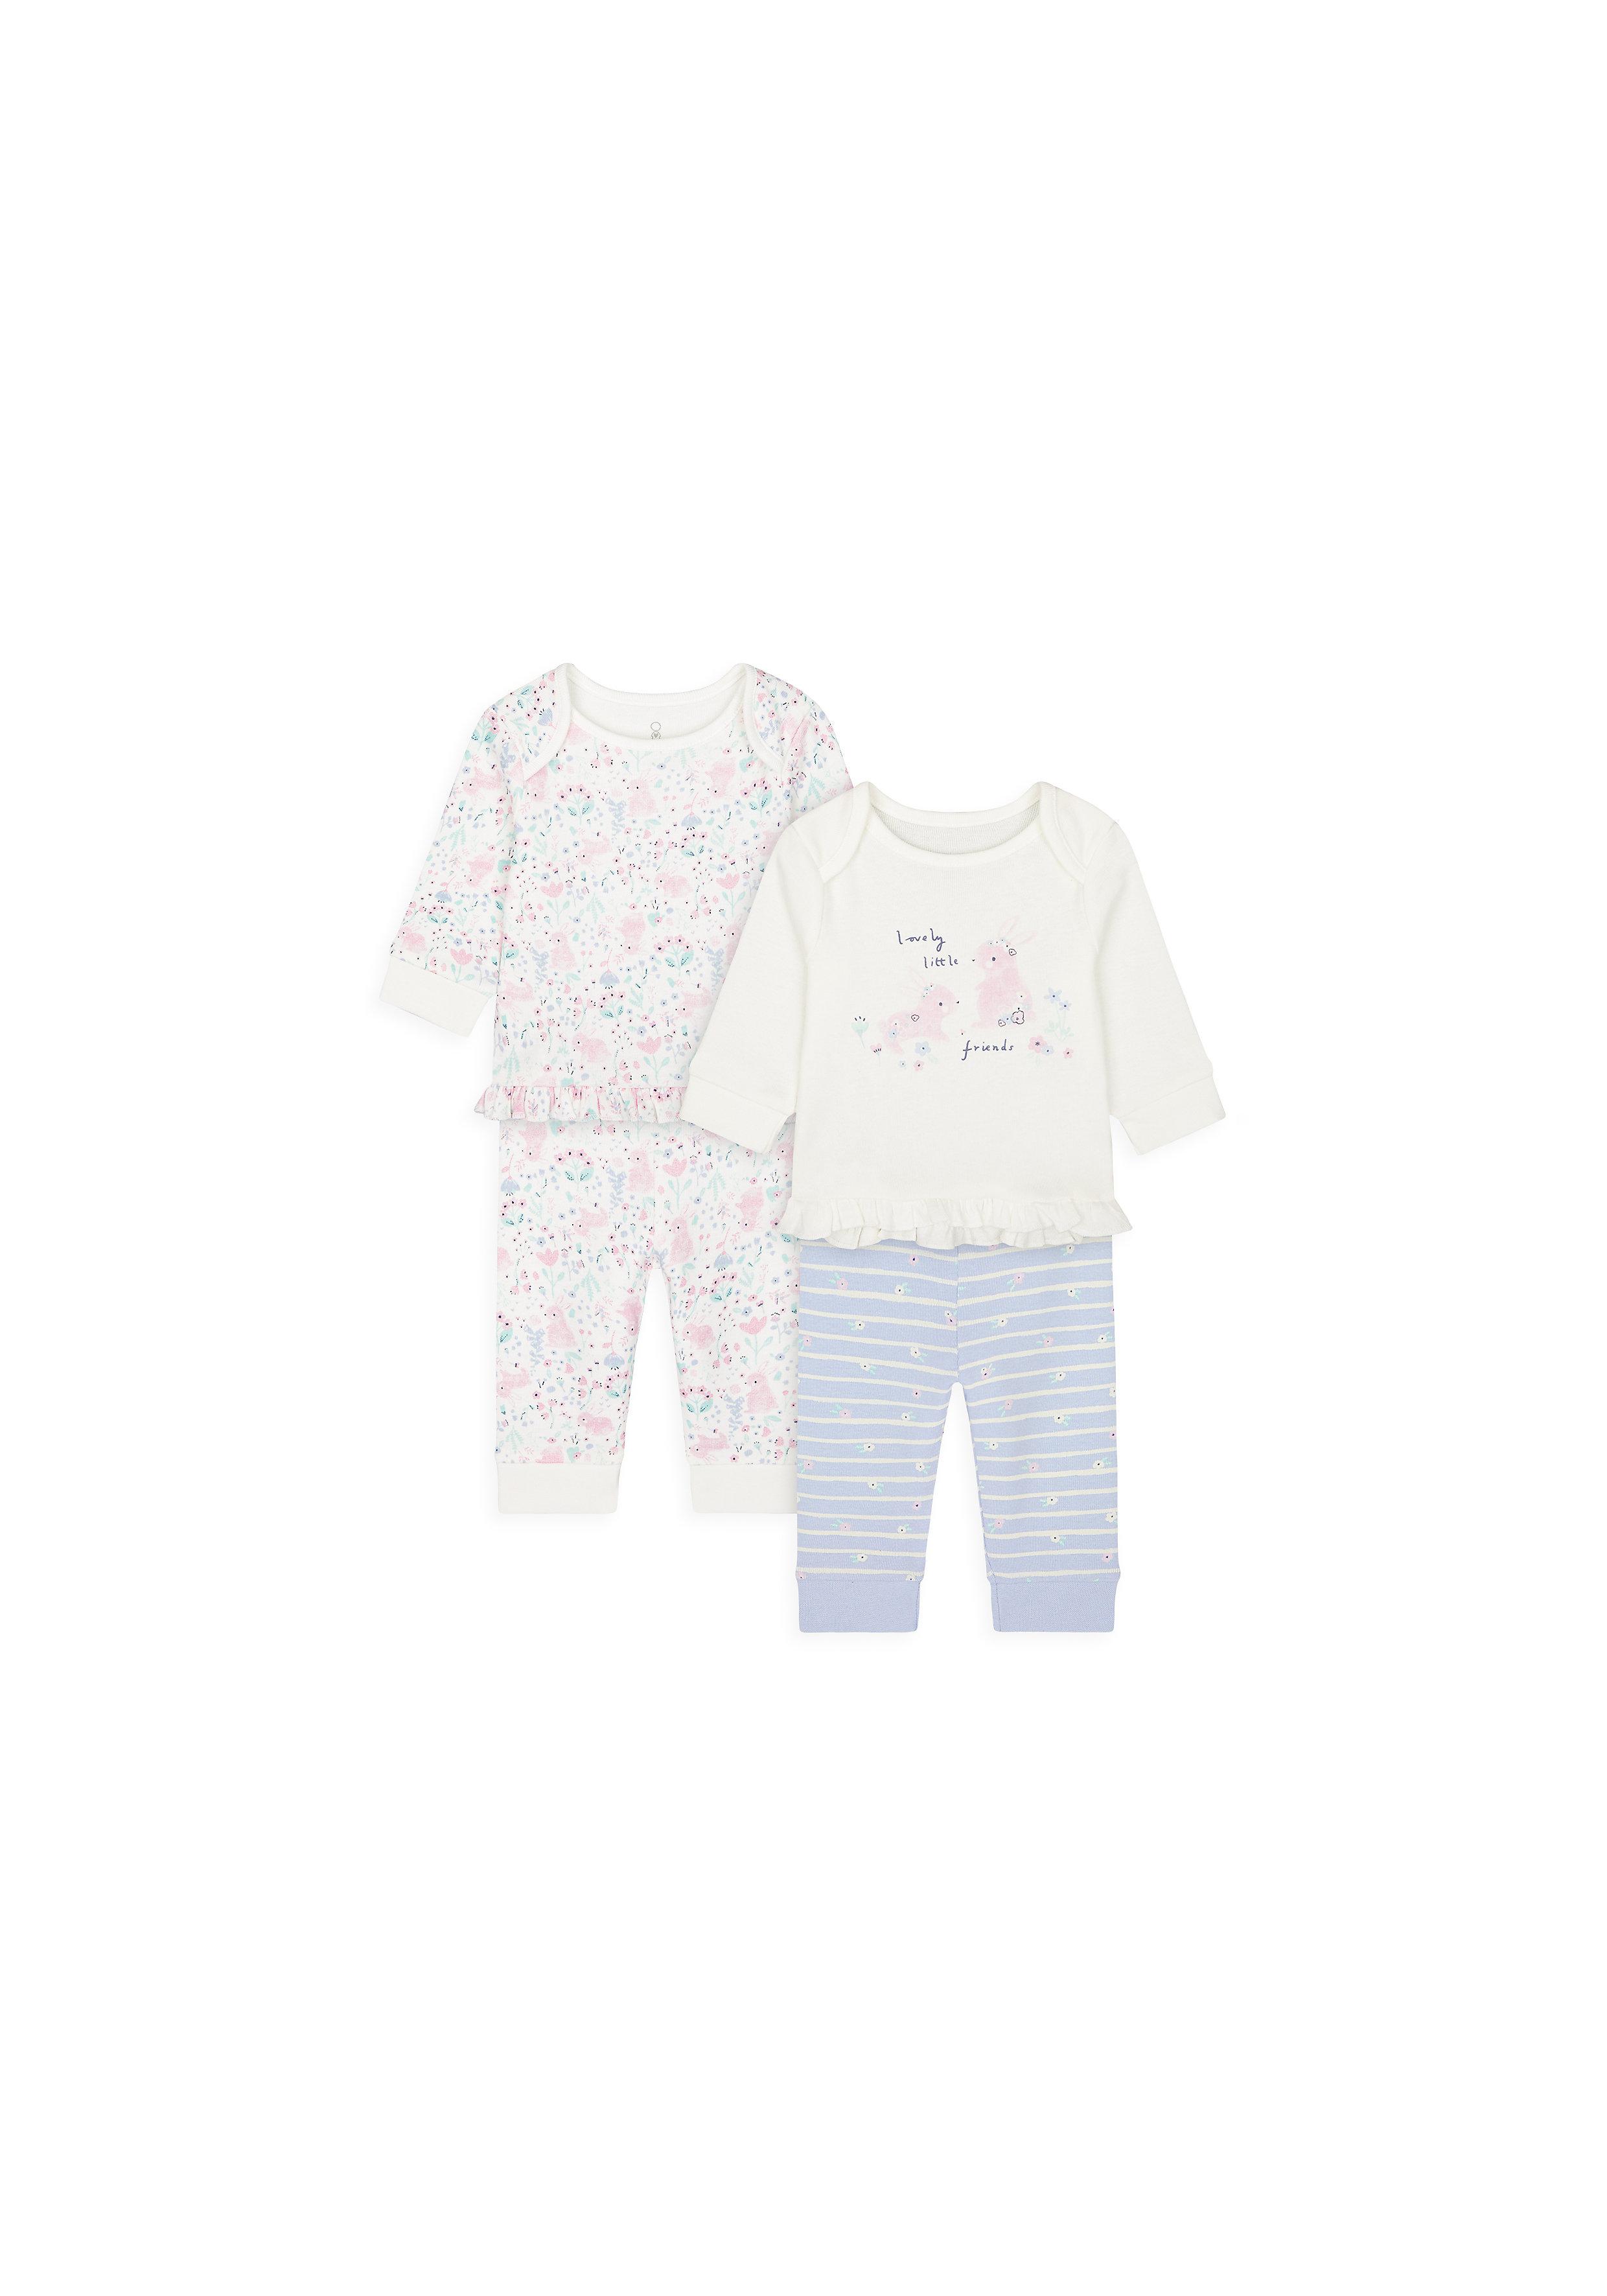 Mothercare | Girls Full Sleeves Pyjama Set Bunny Print - Pack Of 2 - Multicolor